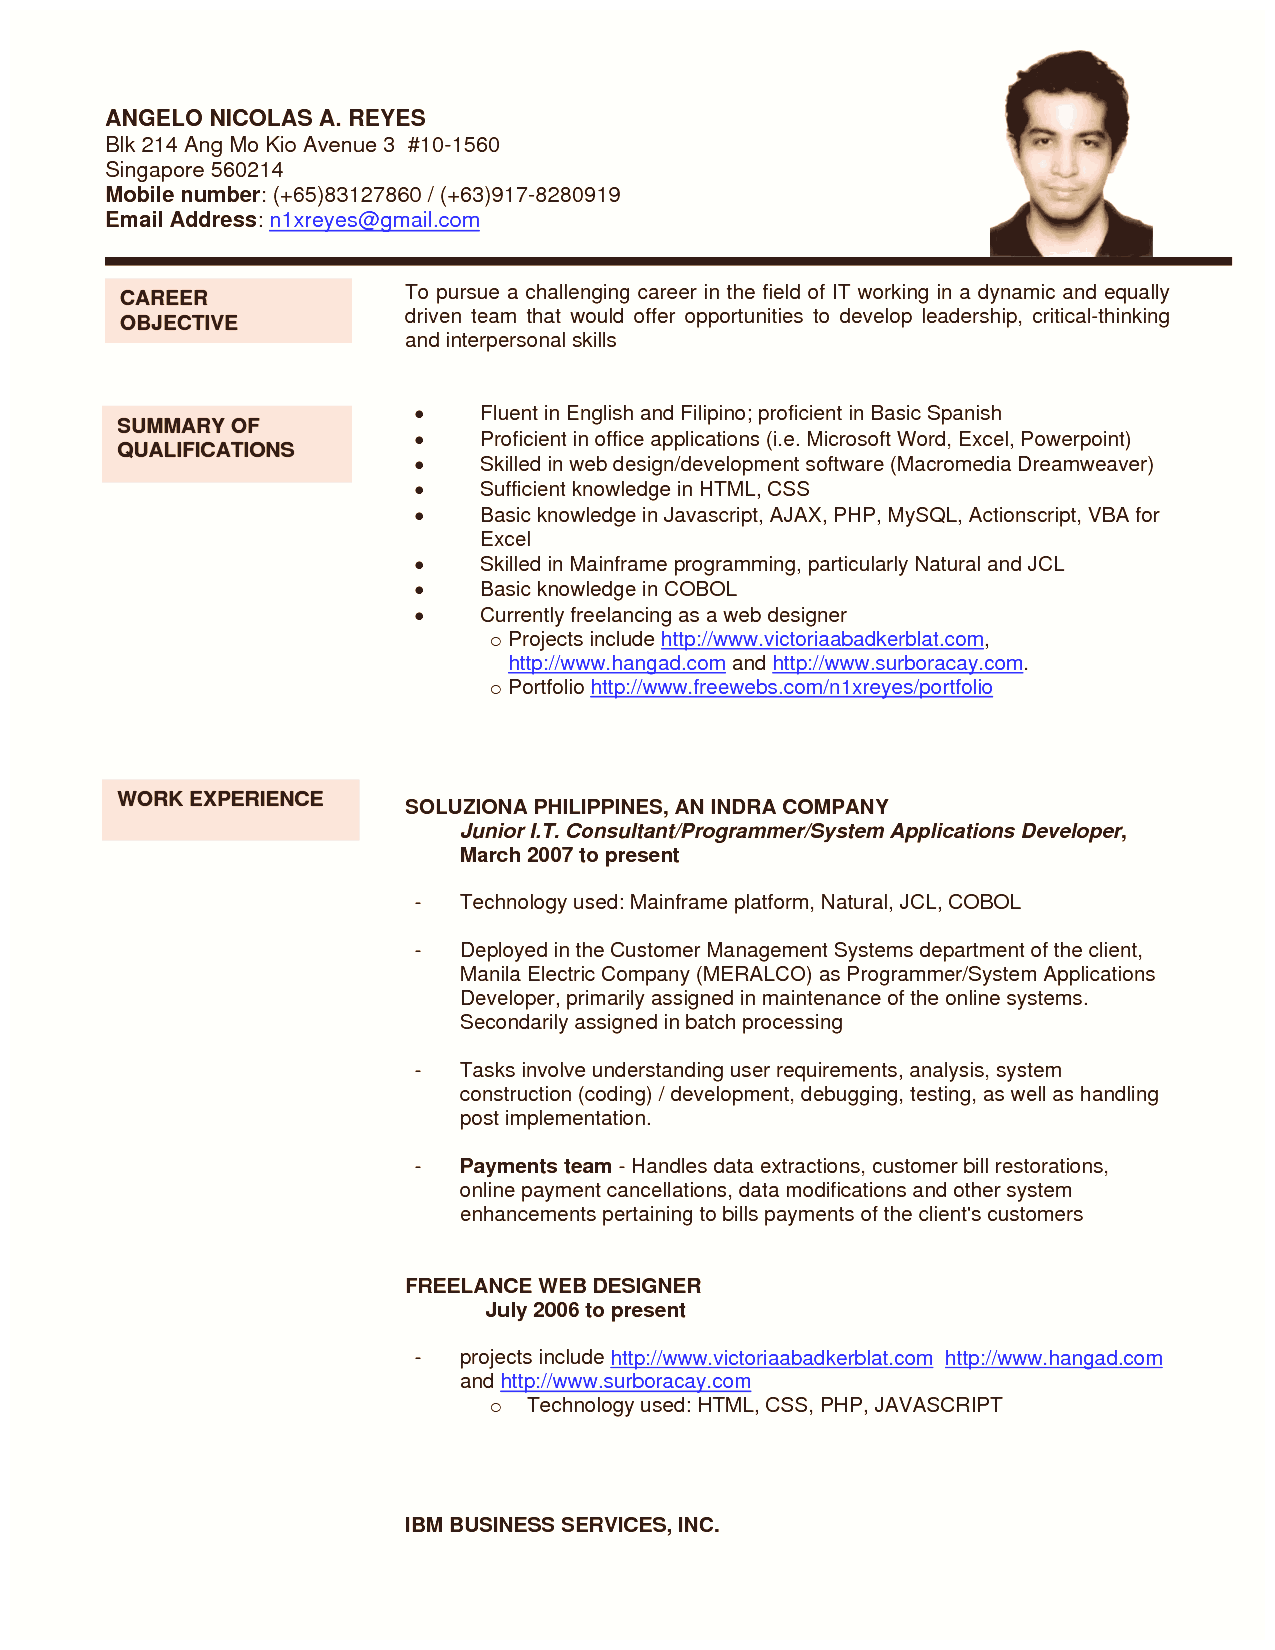 Resume Format Quora Format Quora Resume Resumeformat Resume Format Best Resume Format Chronological Resume